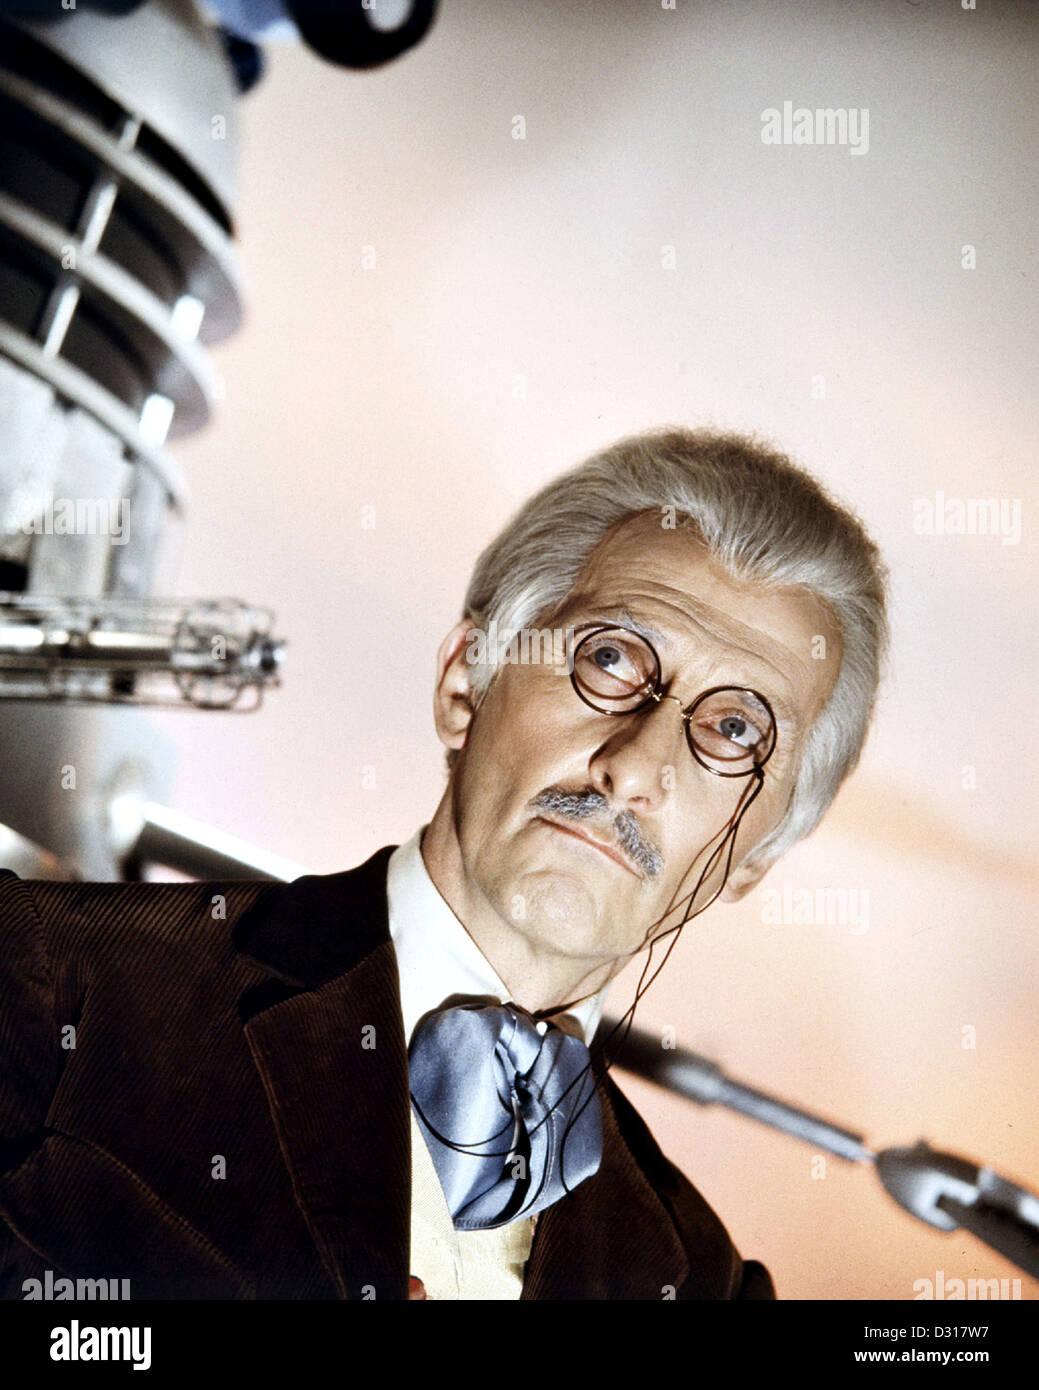 Daleks' Invasion Earth: 2150 A.D. - Stock Image